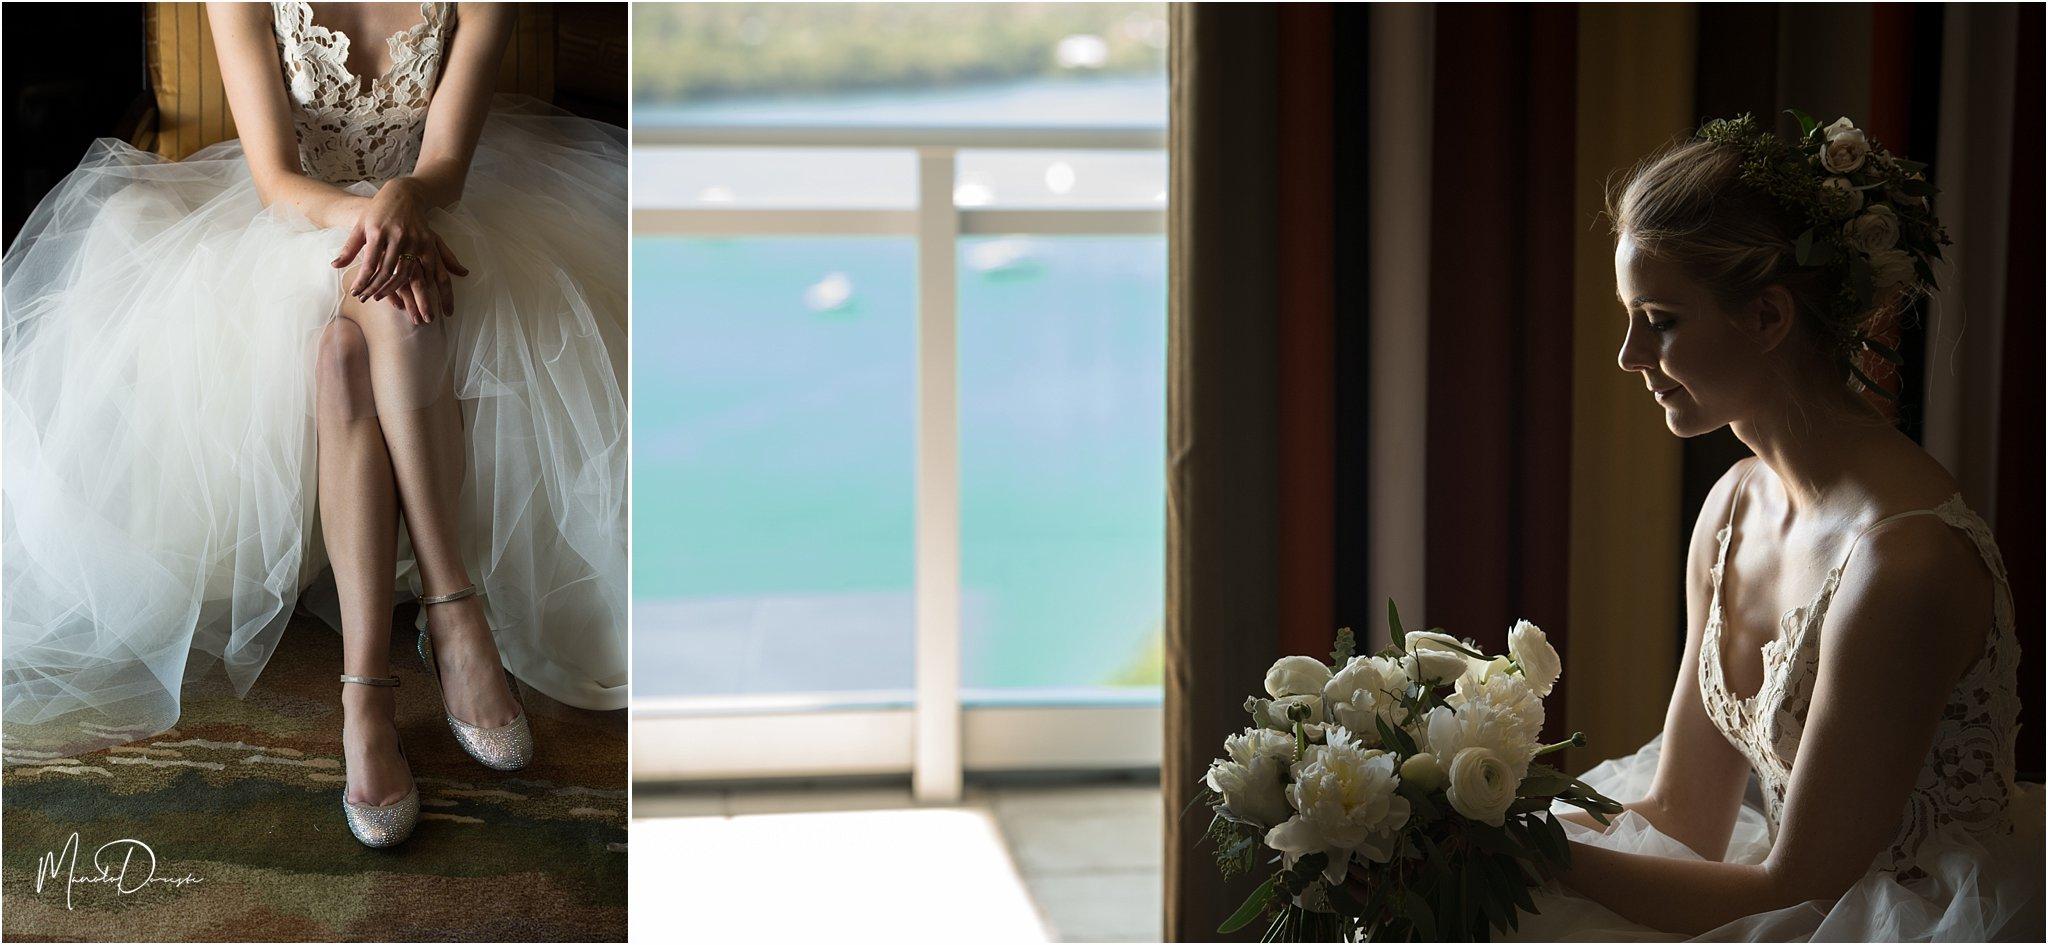 00874_ManoloDoreste_InFocusStudios_Wedding_Family_Photography_Miami_MiamiPhotographer.jpg